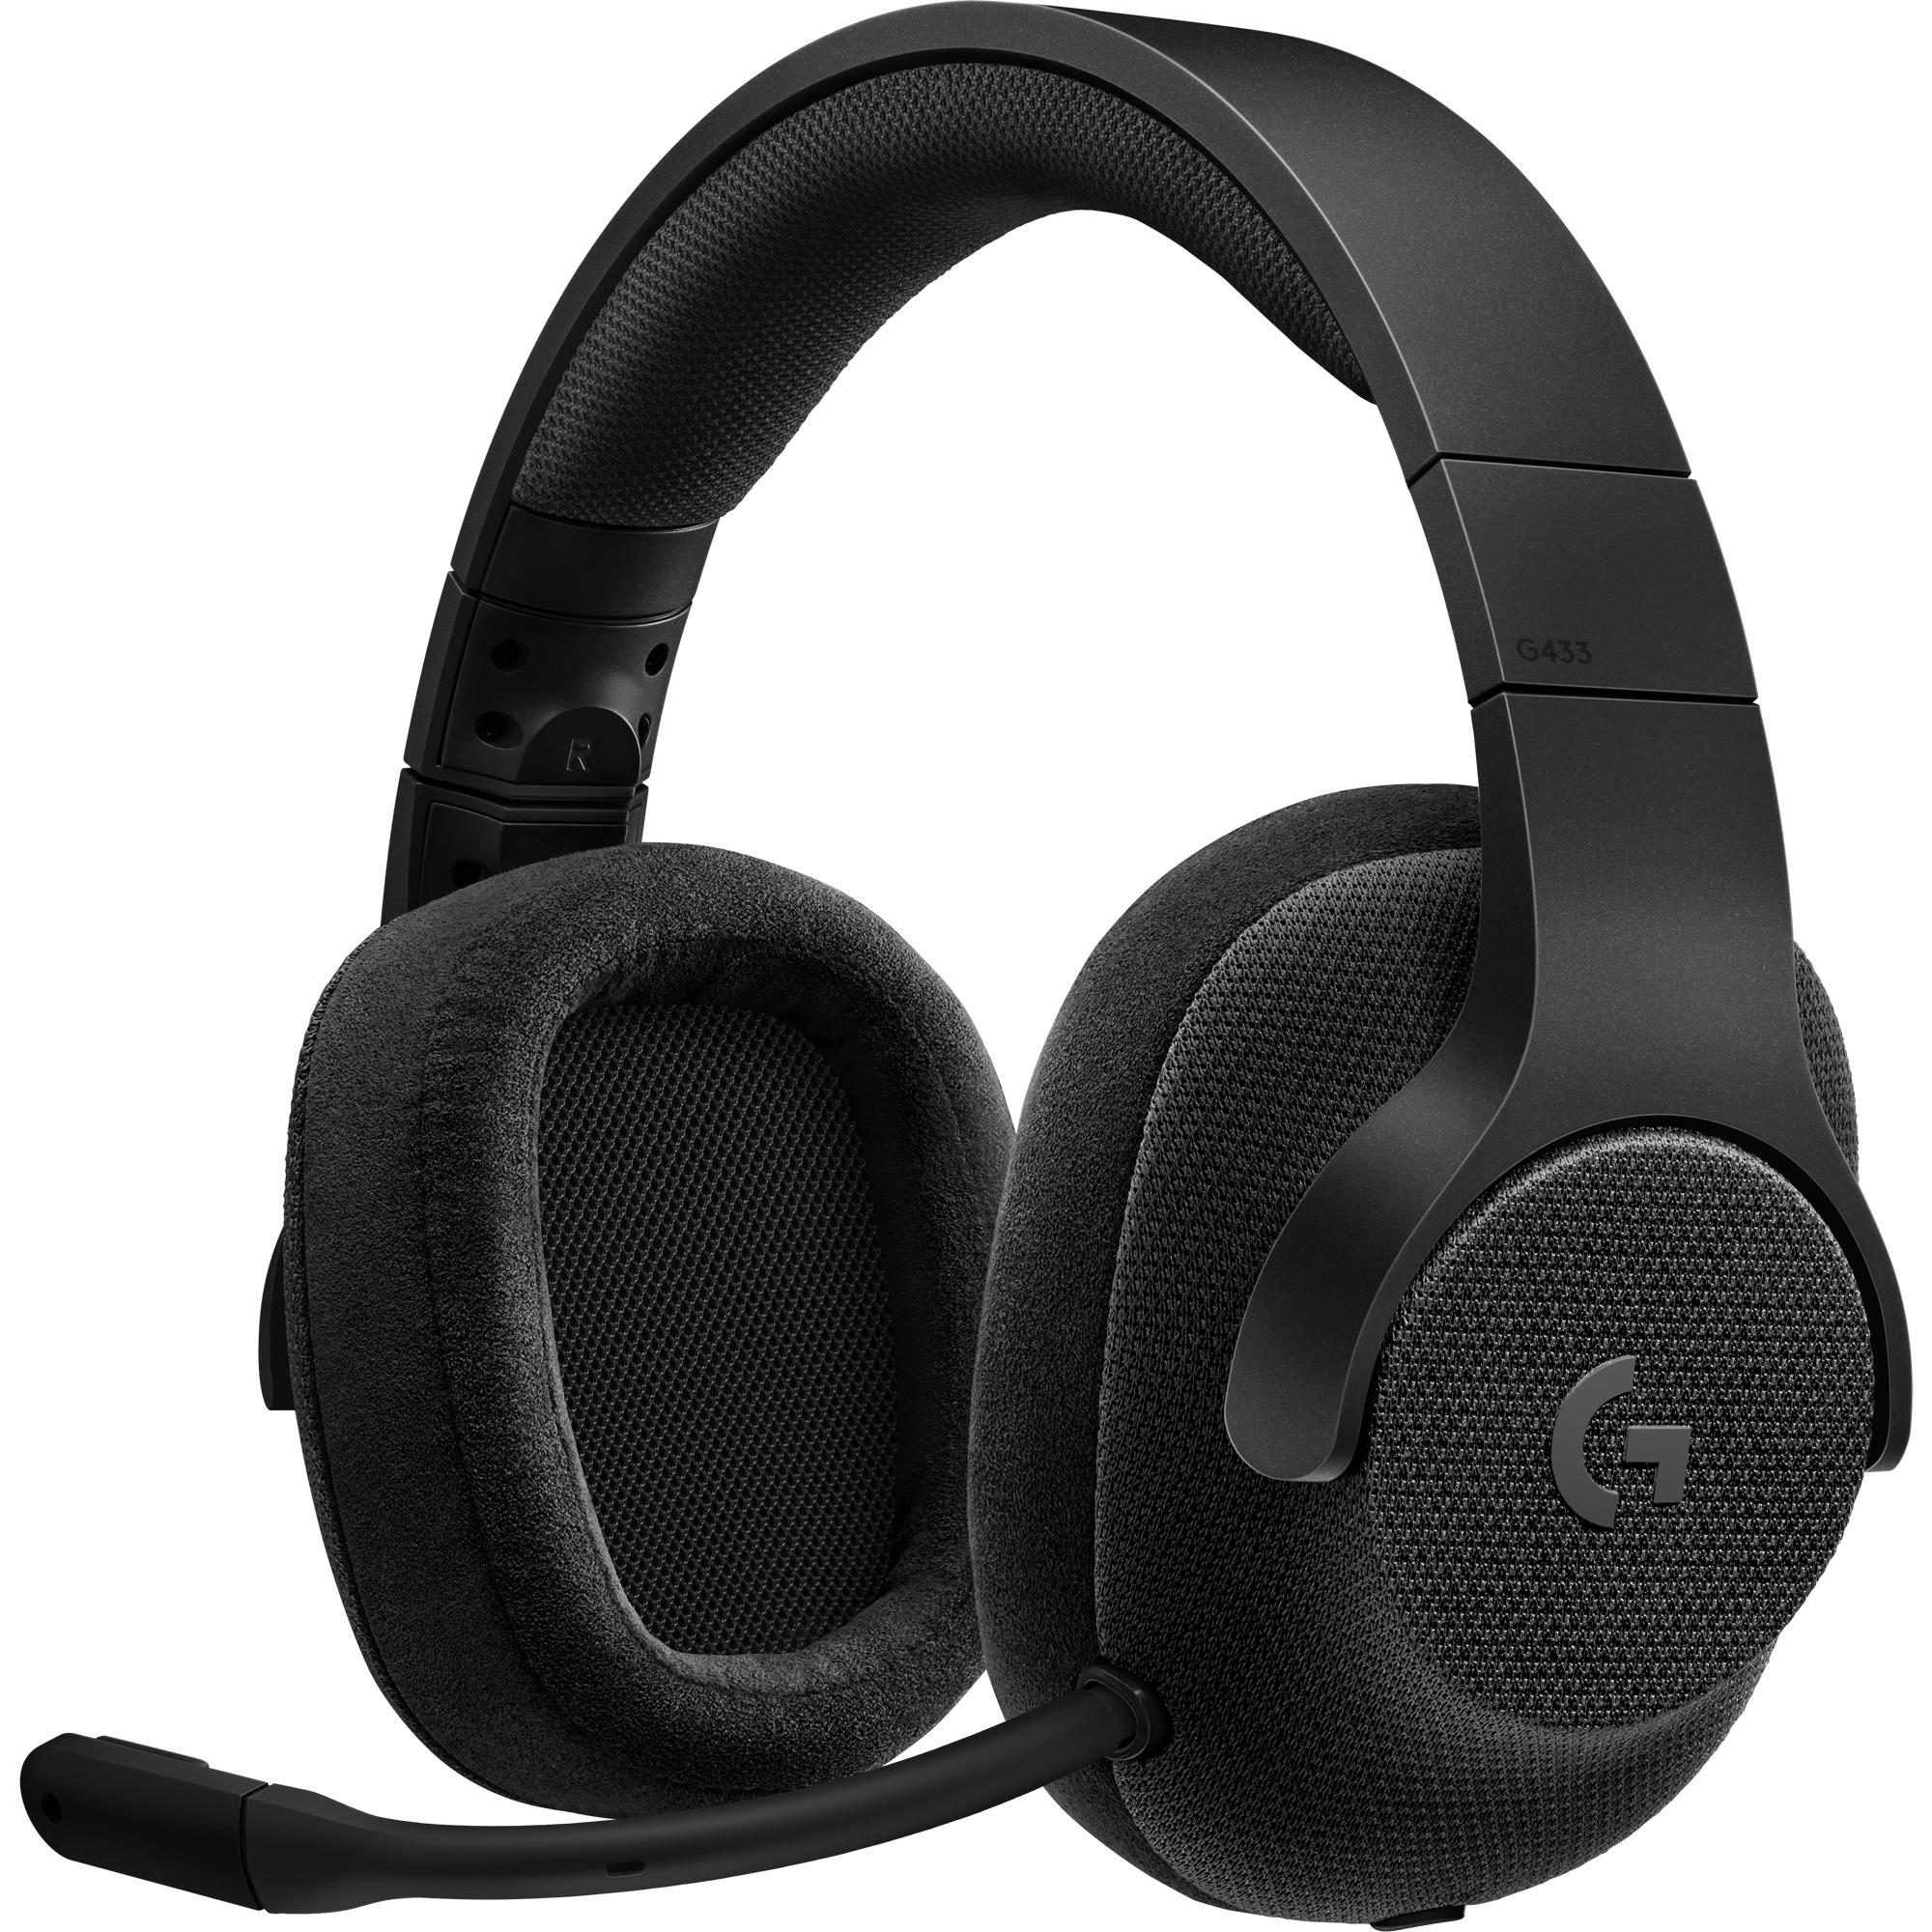 G433 Binaurale Diadema Negro auricular con micrófono, Auriculares con micrófono